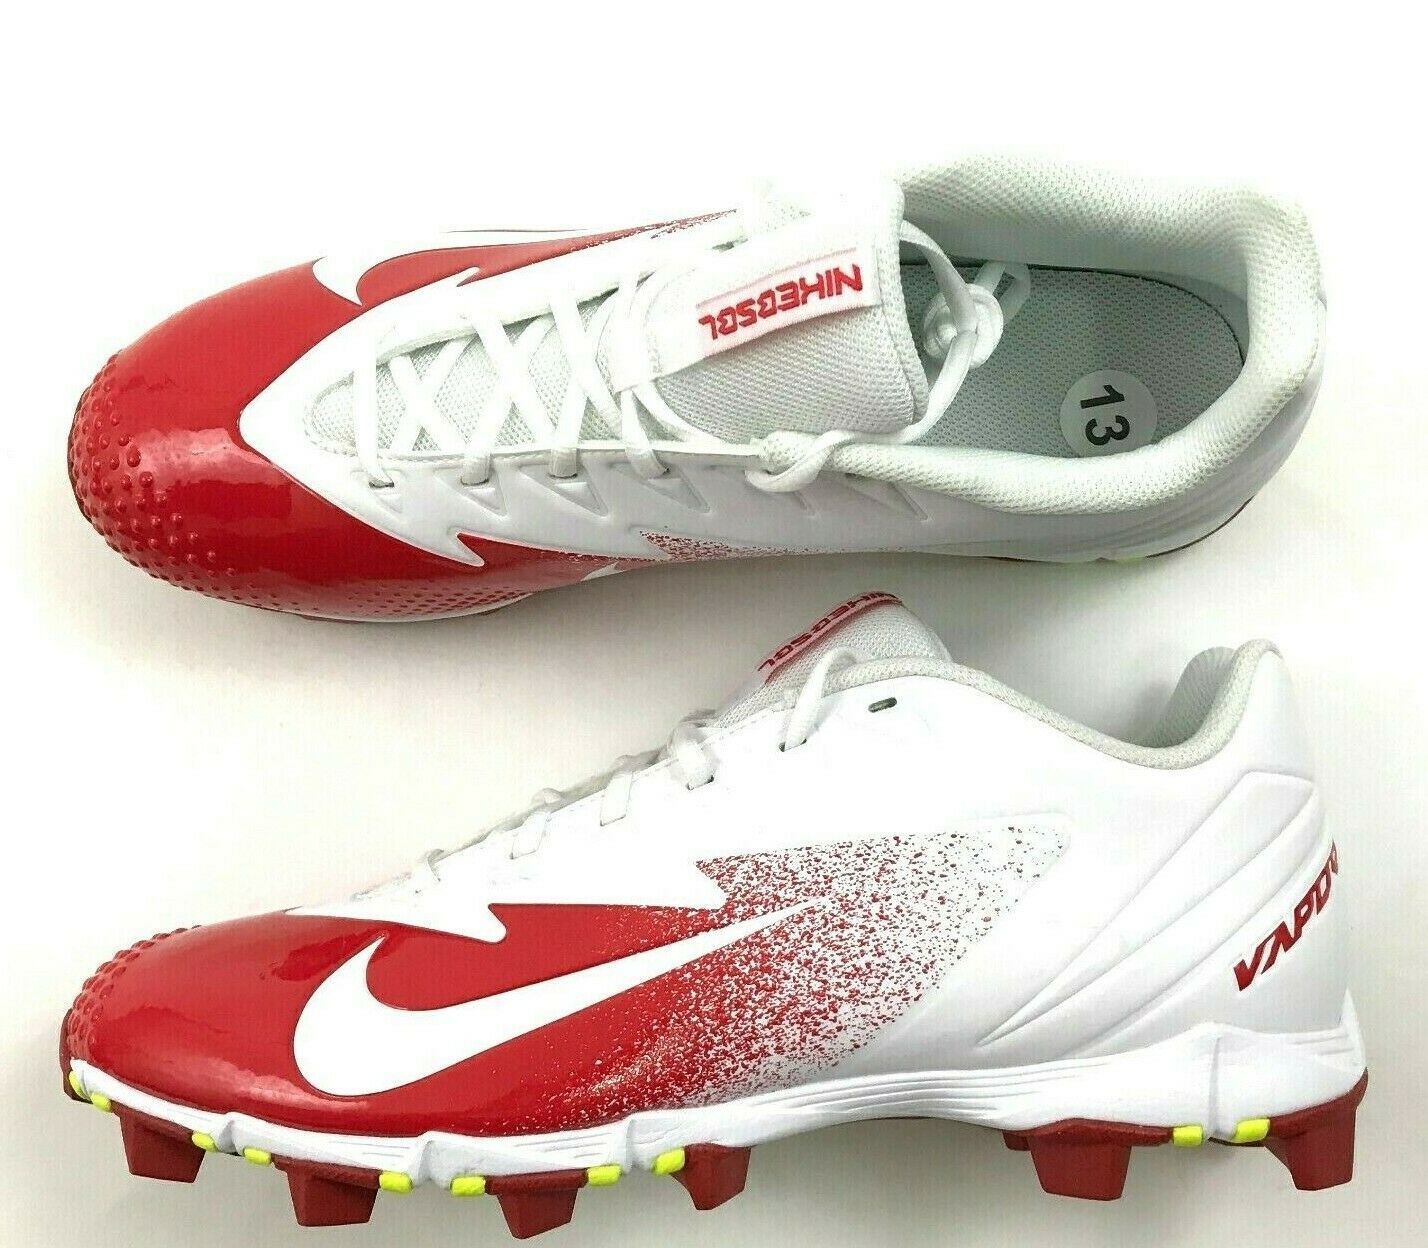 big sale 9c0fa bd163 Nouveau Nike Hommes Vapor Ultrafly Keystone and 33 similar items. 57